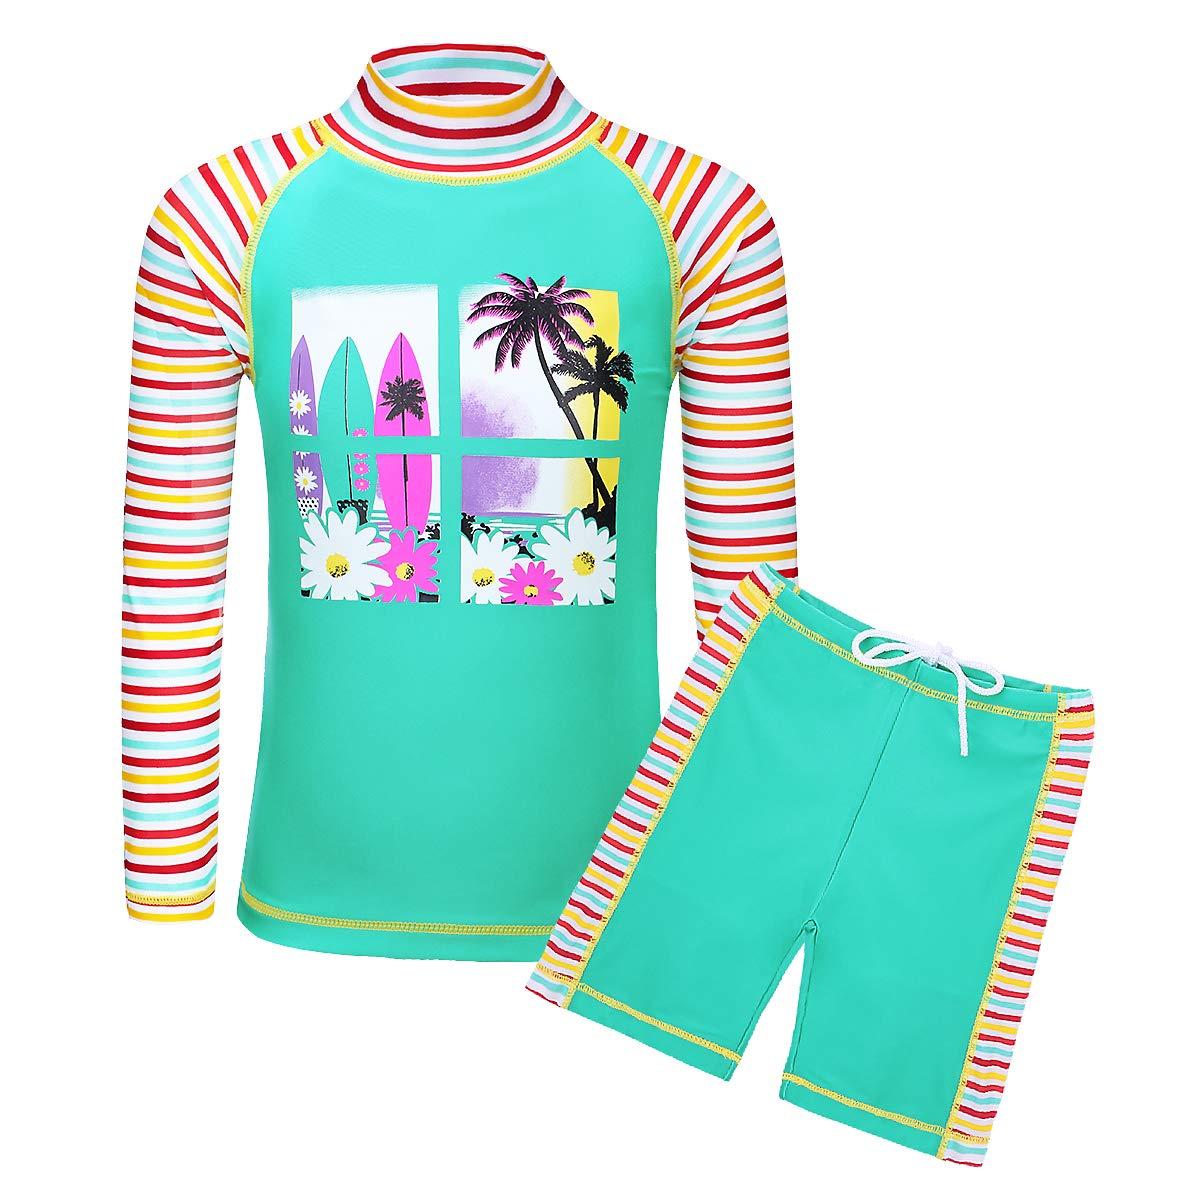 TFJH E Kids Girls Two Piece UPF 50+ UV Swimsuit Rash Guard Suit 3-12 Years